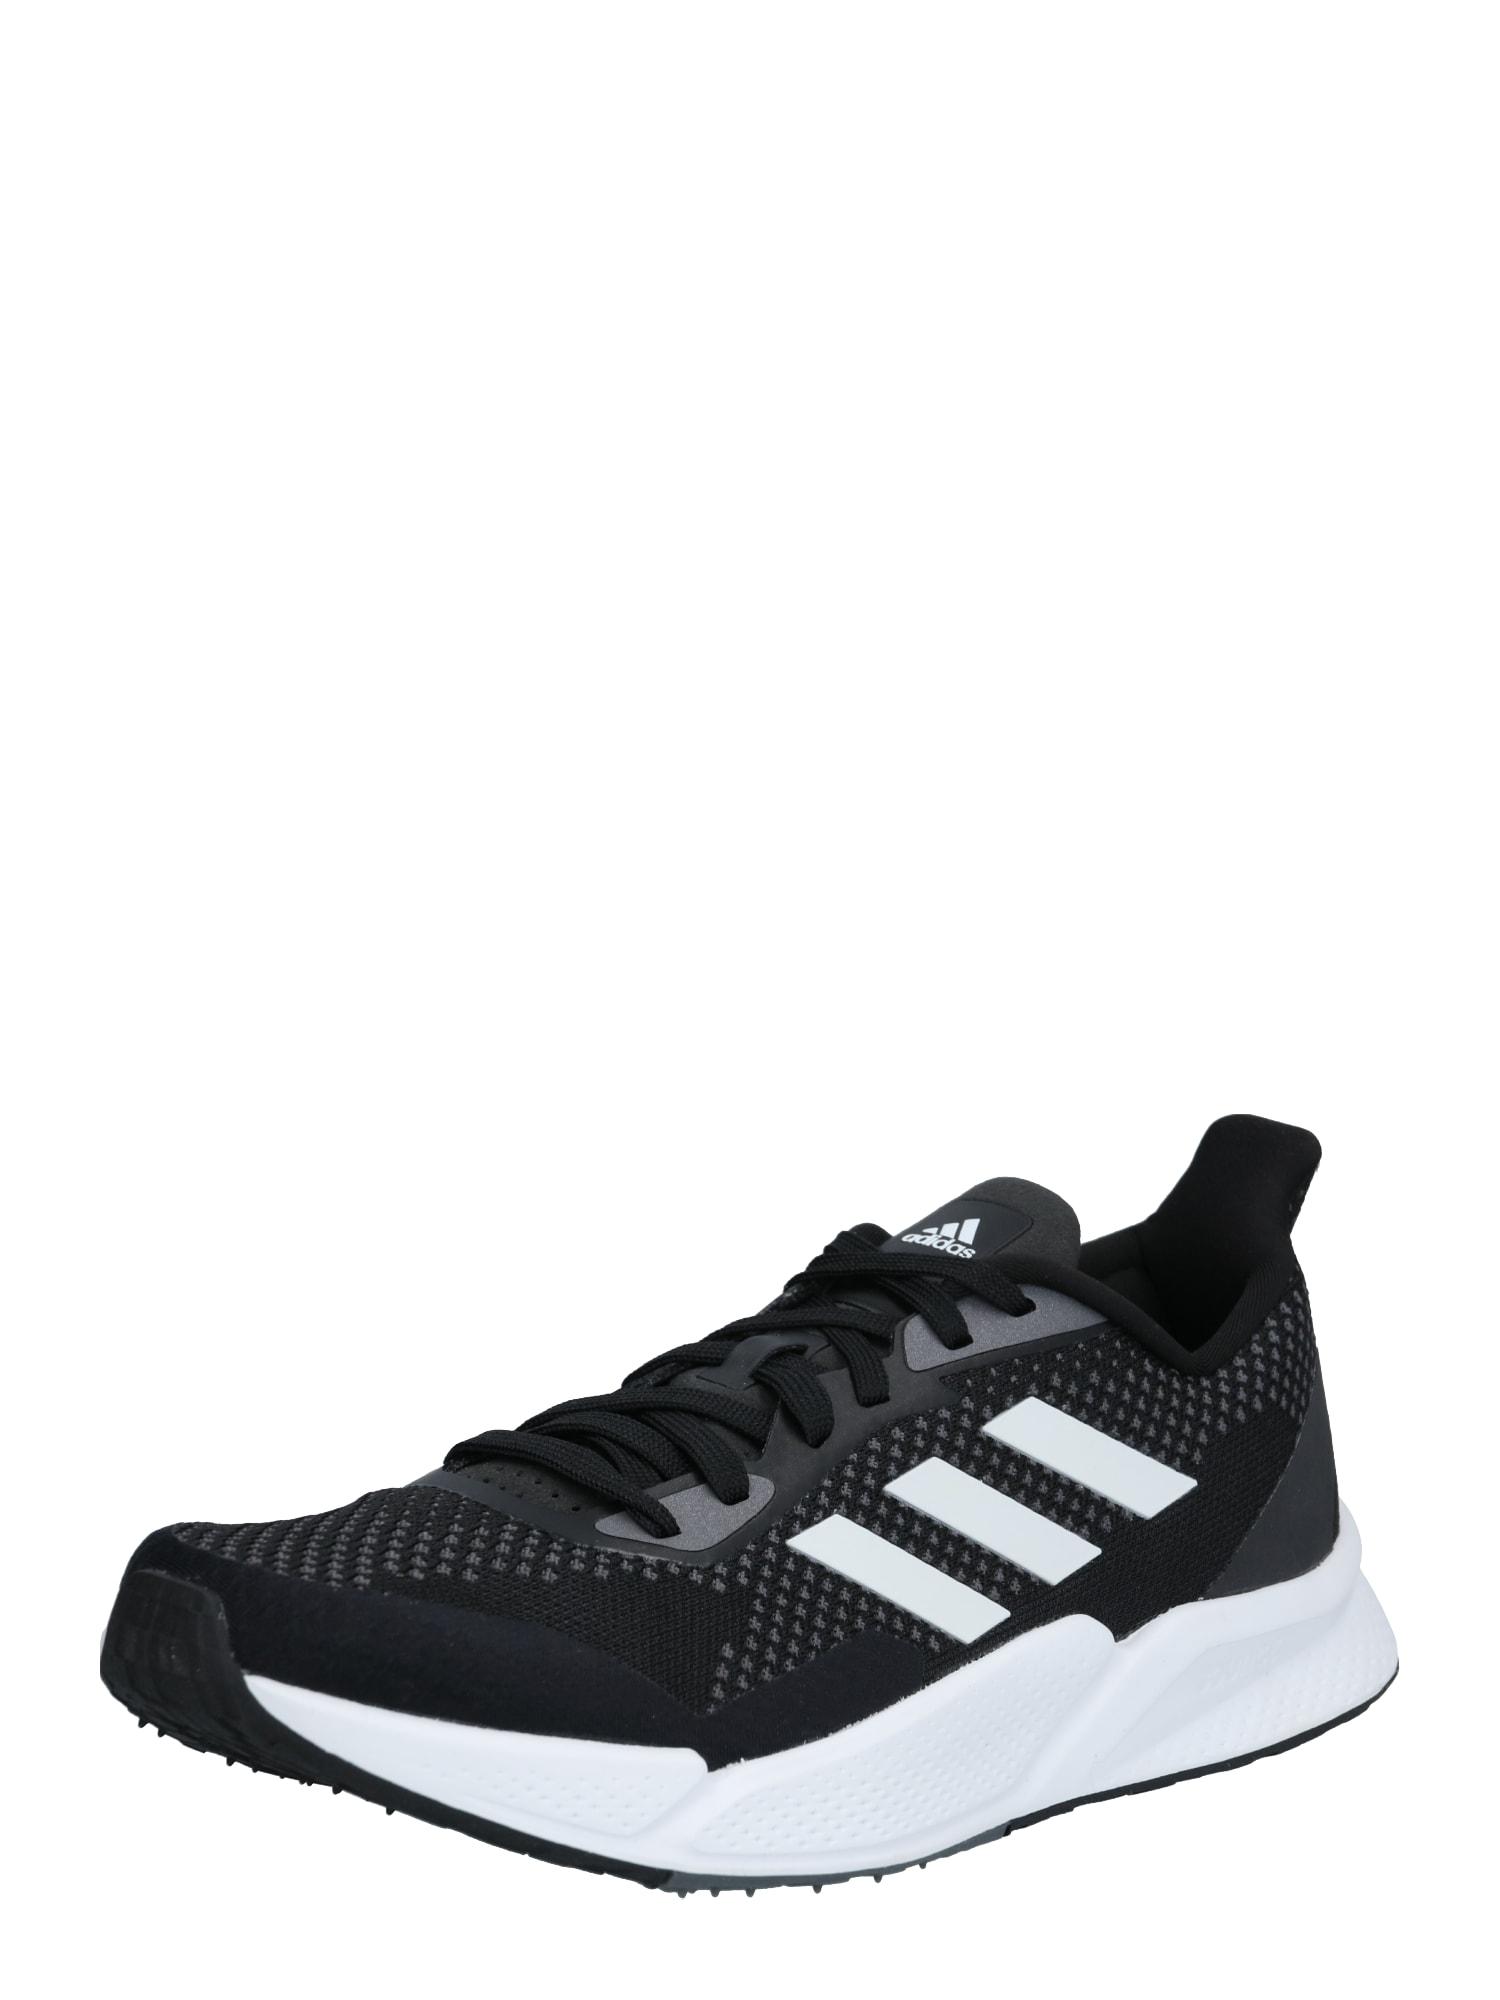 ADIDAS PERFORMANCE Bėgimo batai juoda / balta / pilka